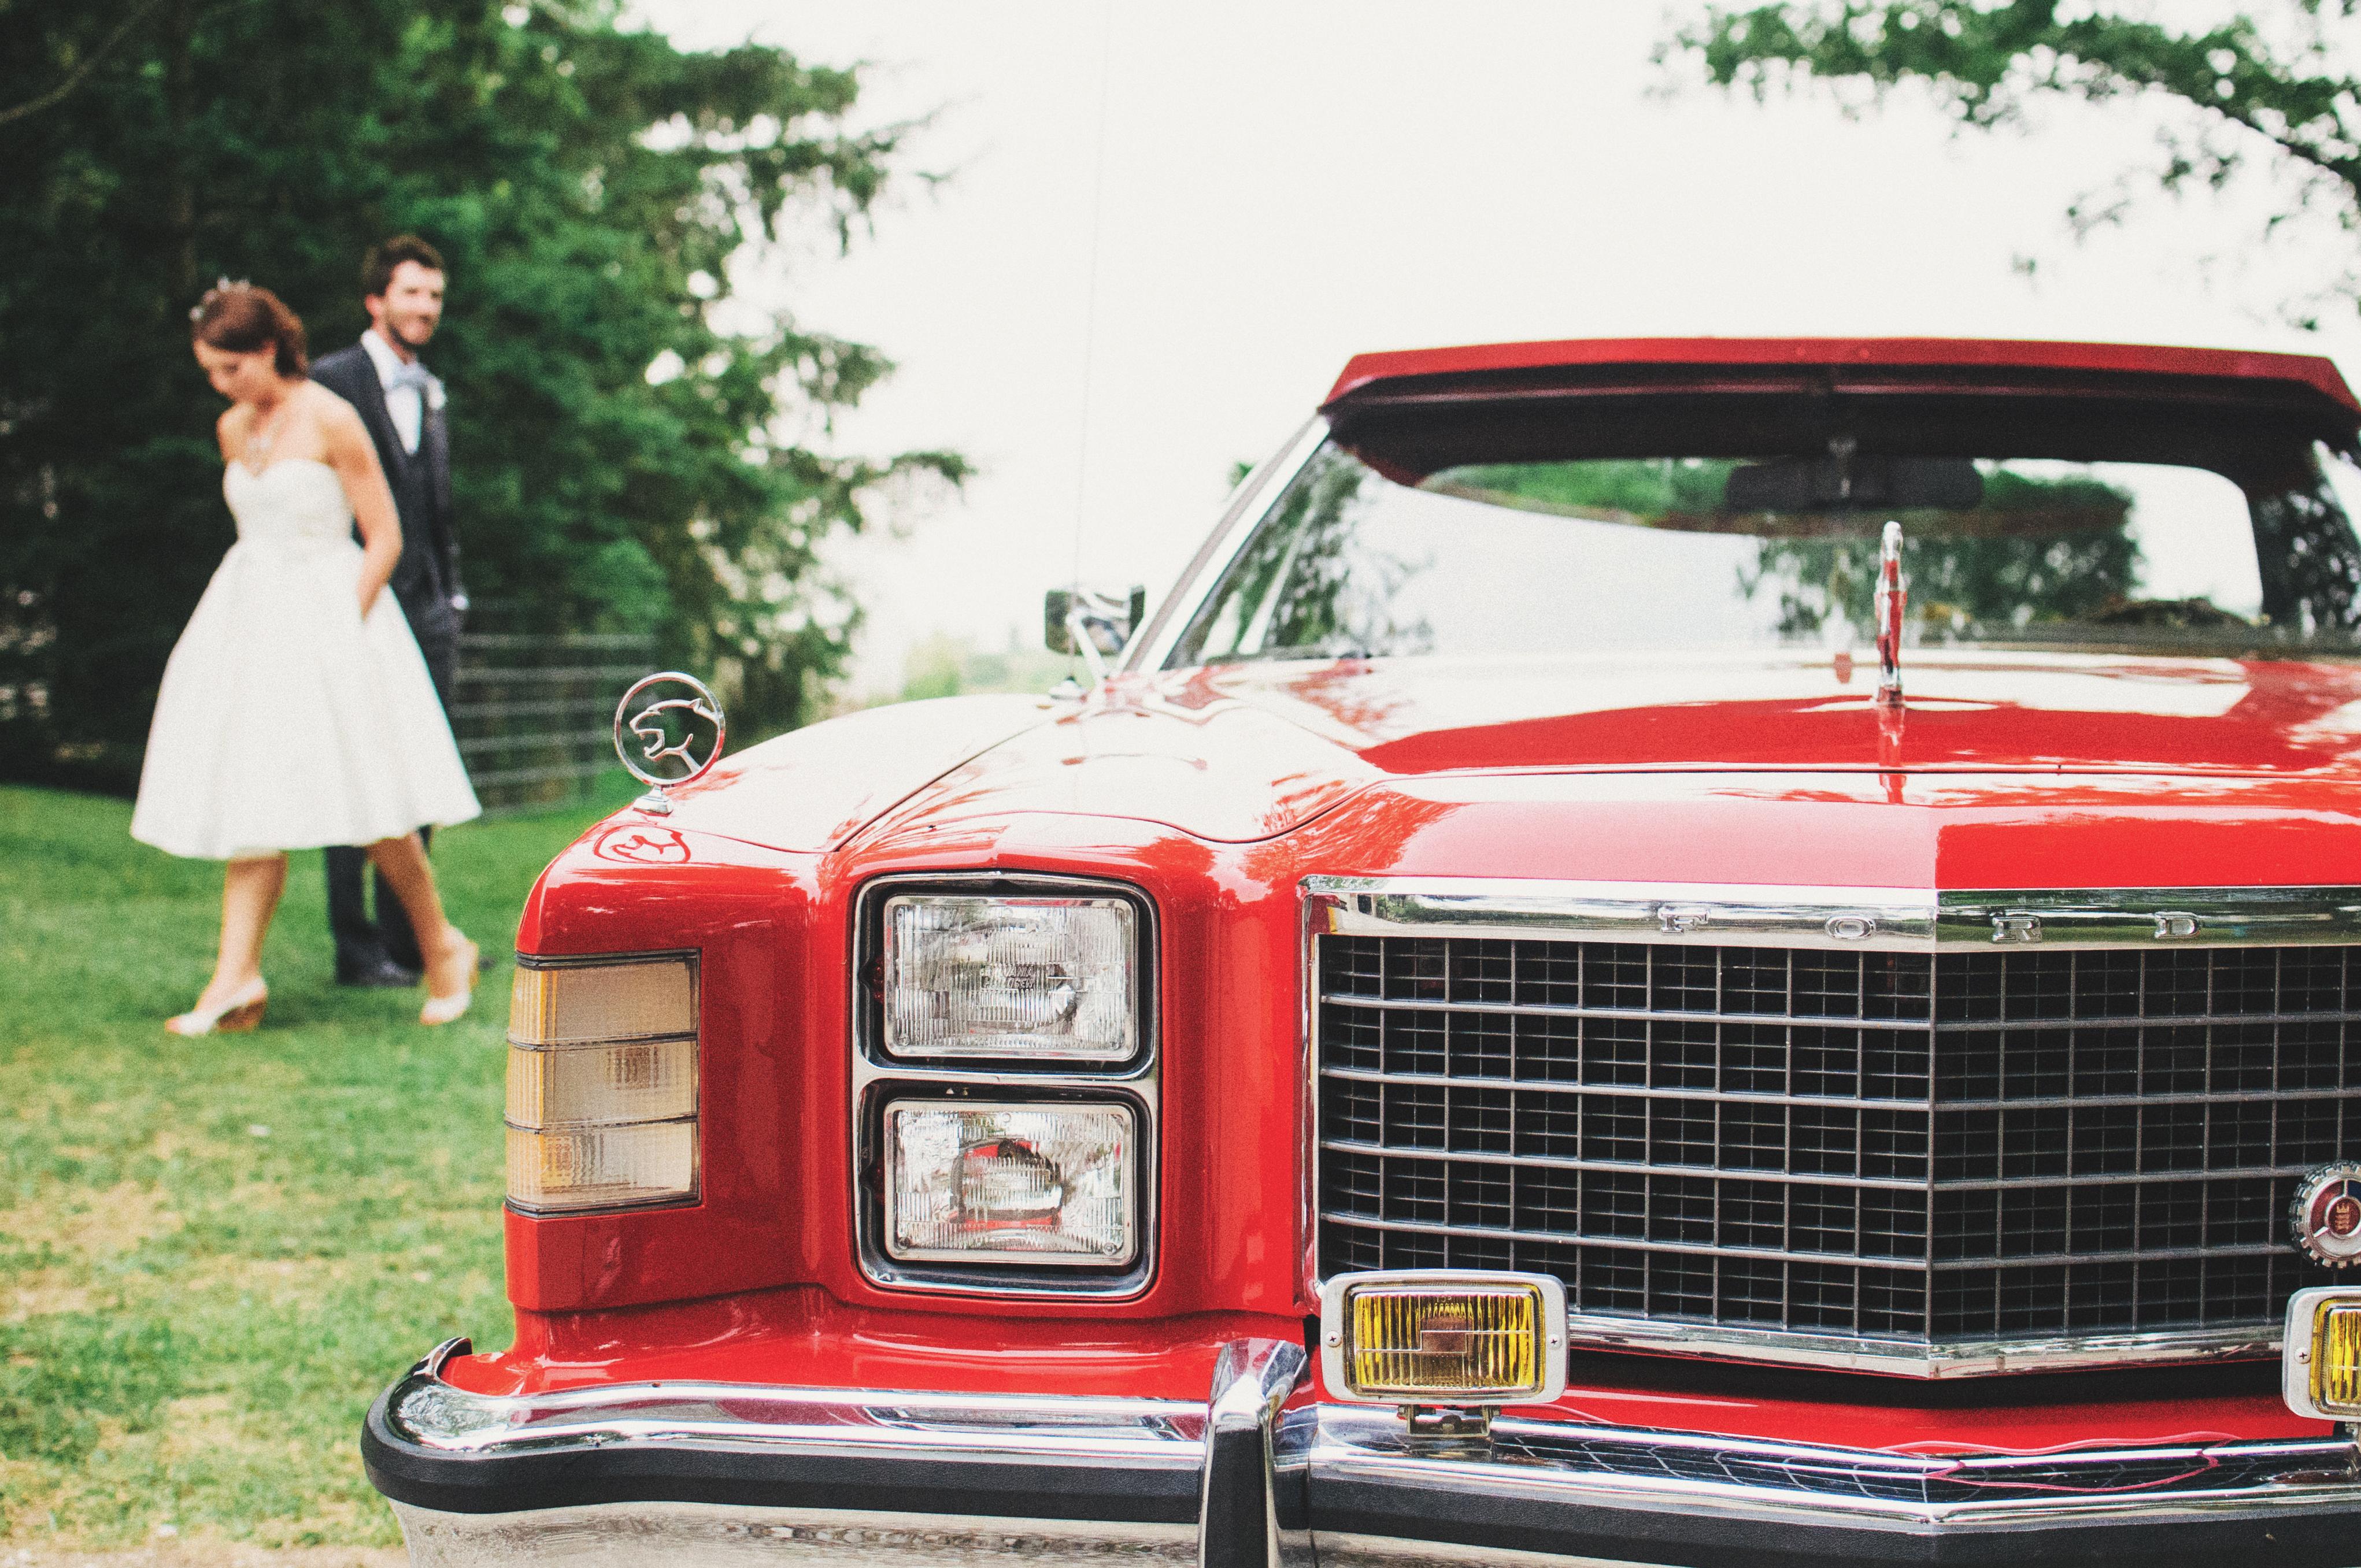 Free Images : retro, red, wedding, motor vehicle, vintage car, close ...